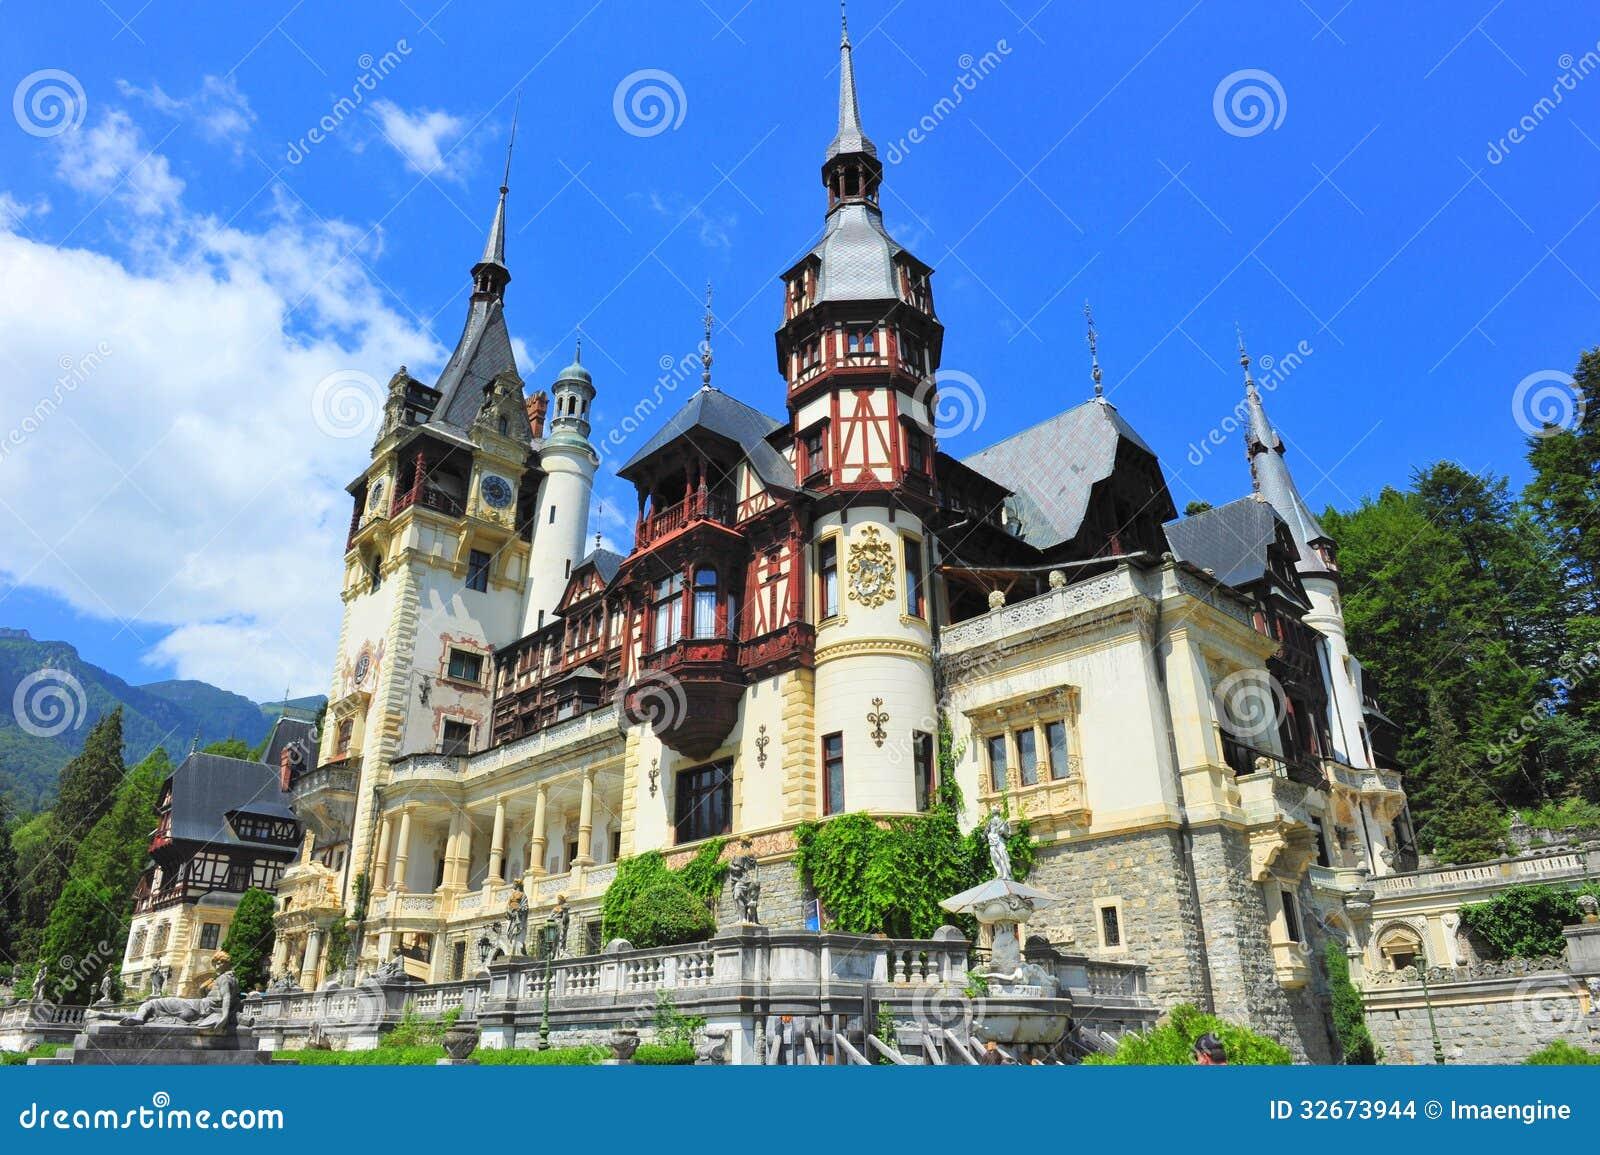 Peles castle sinaia romania stock photo image 32673944 - Romanian architectural styles ...